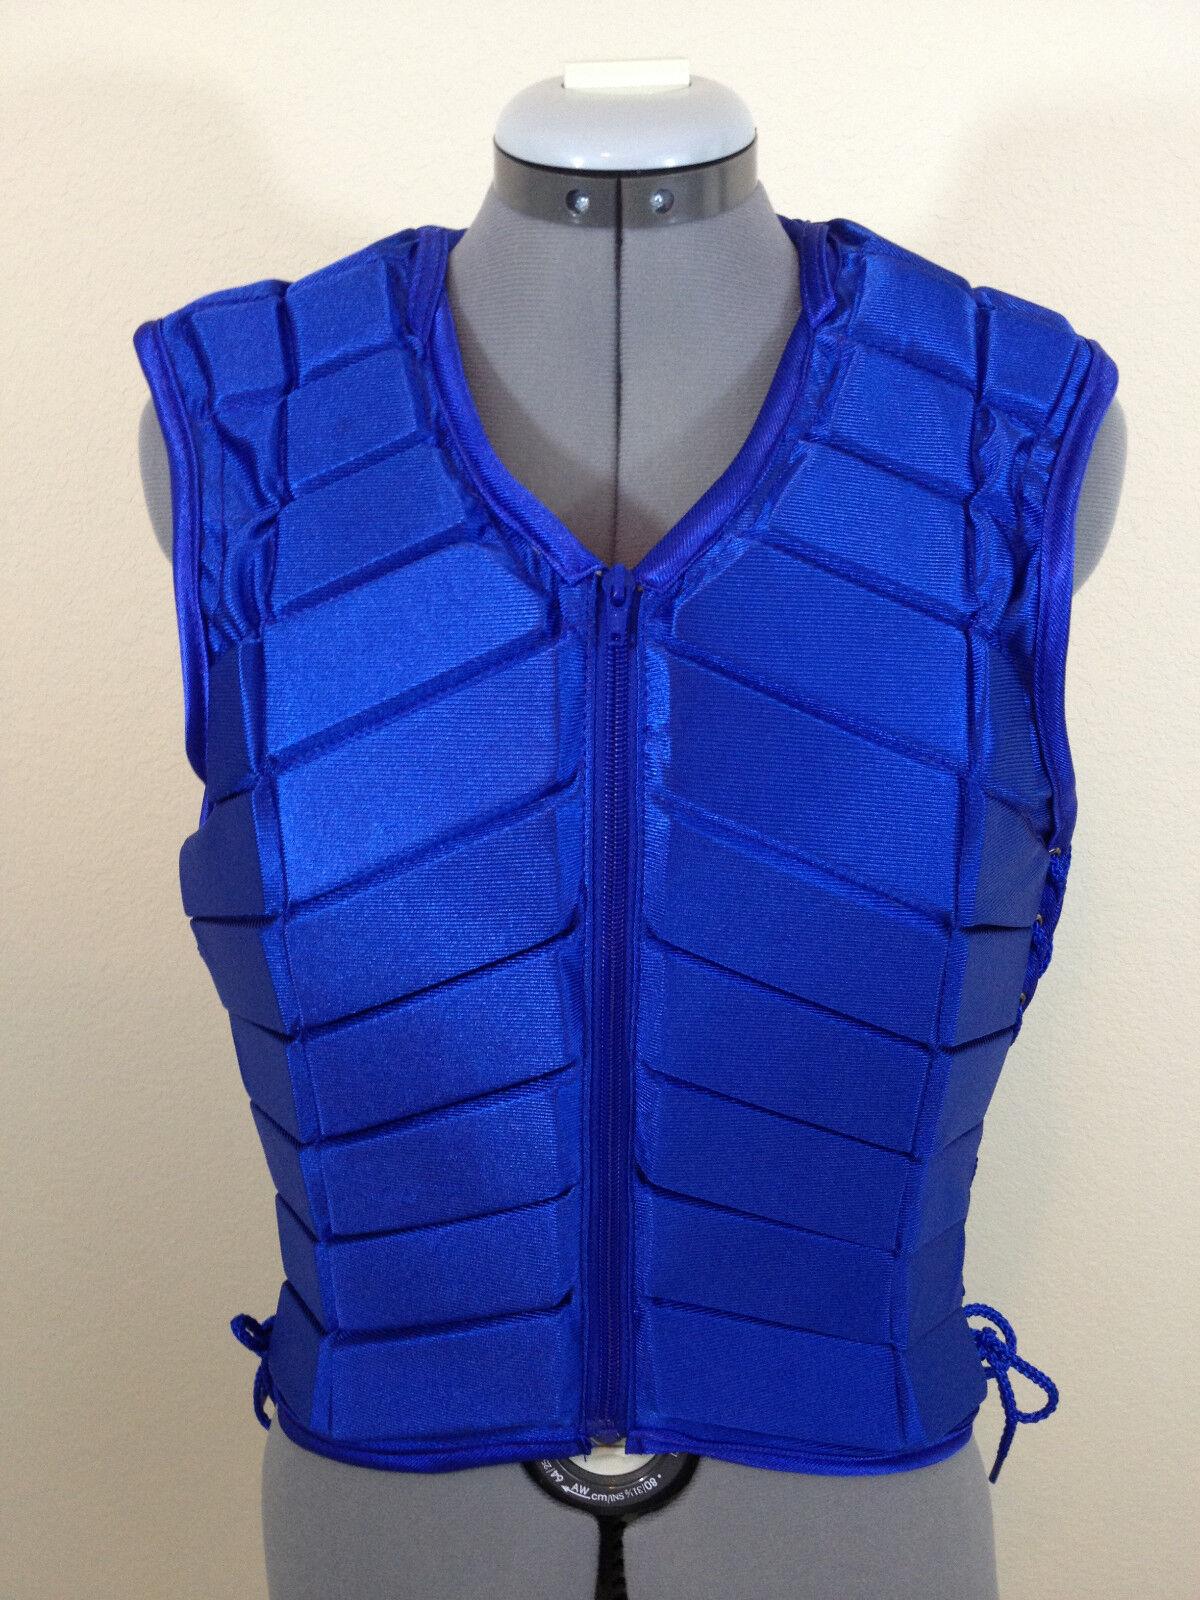 Horse Riding Safety Equestrian eventer Protective Protection Protection Protection Vest youth ROT c2b620